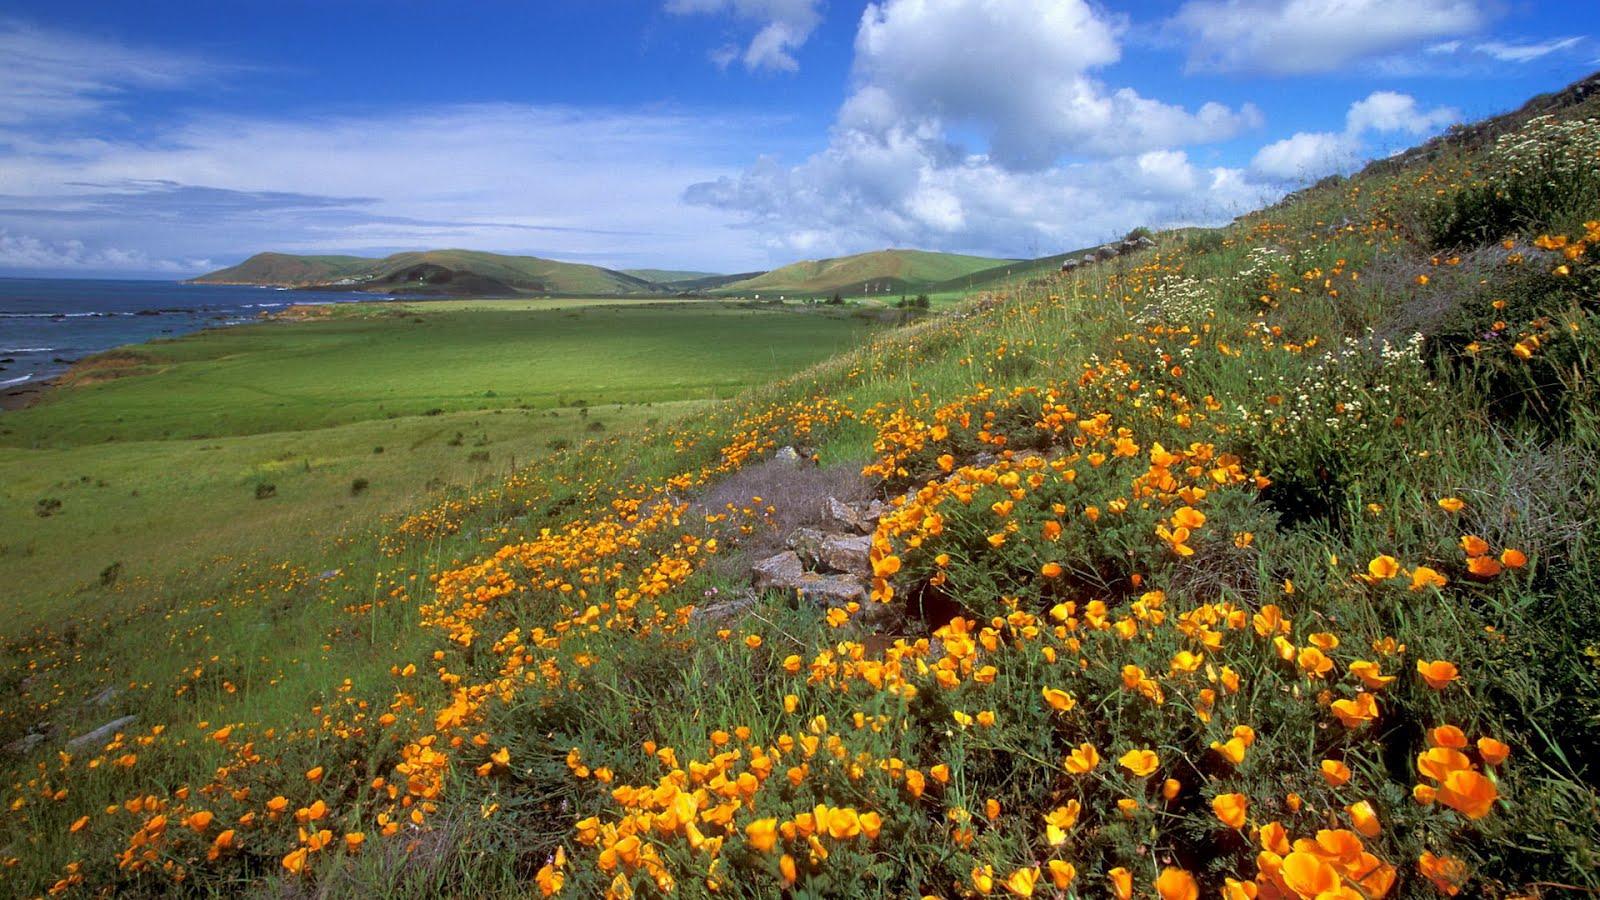 http://2.bp.blogspot.com/-tB5urTcjJC8/T560HiXDmDI/AAAAAAAAAEg/VVSE-0Opnng/s1600/HD-Wallpapers_Free_Nature_Flowers%2Bin%2Bthe%2Bmeadows_-762504.jpg